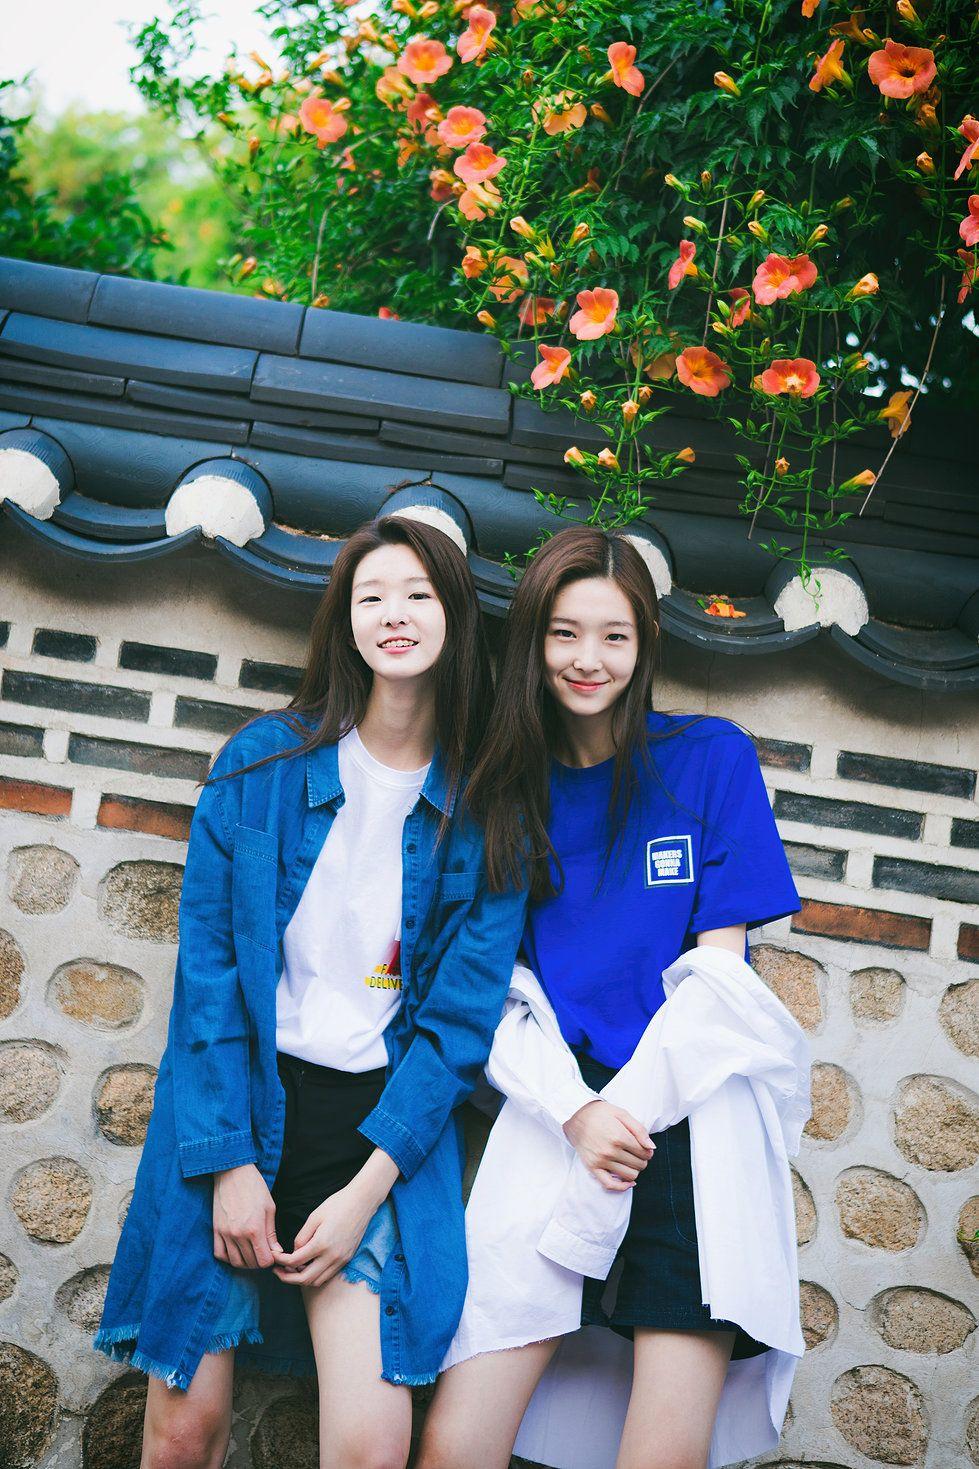 Koreanmodel Street Style Project   @seoooohyeon0821, @seooooyoon0821   Page